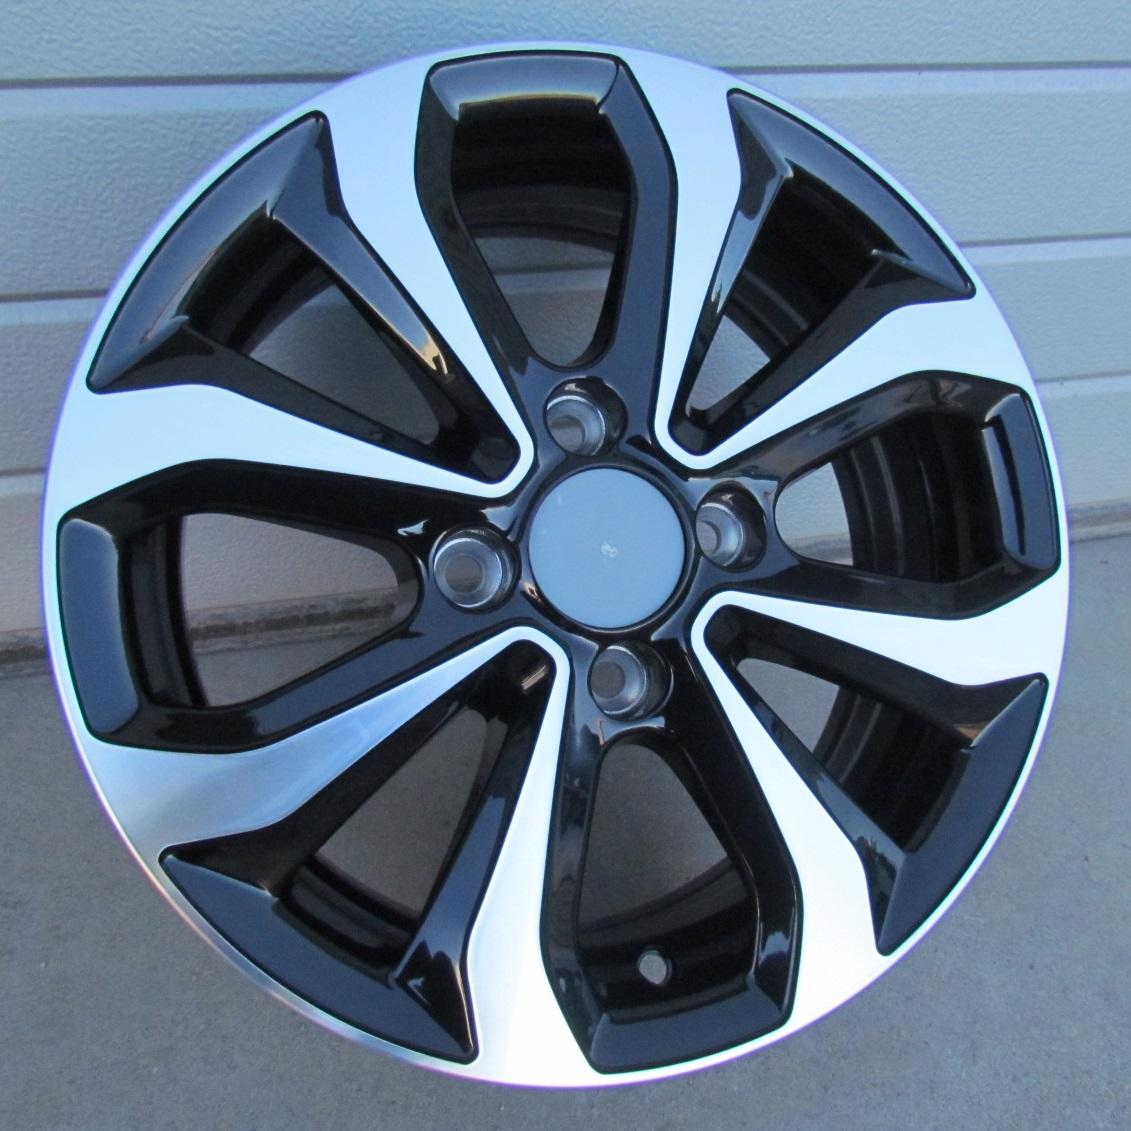 R14X5.5 4X100 ET38 54.1 XFE275 MB+POWDER COATING RWR Hyundai (+2eur) (P1)## 5.5x14 ET38 4x100